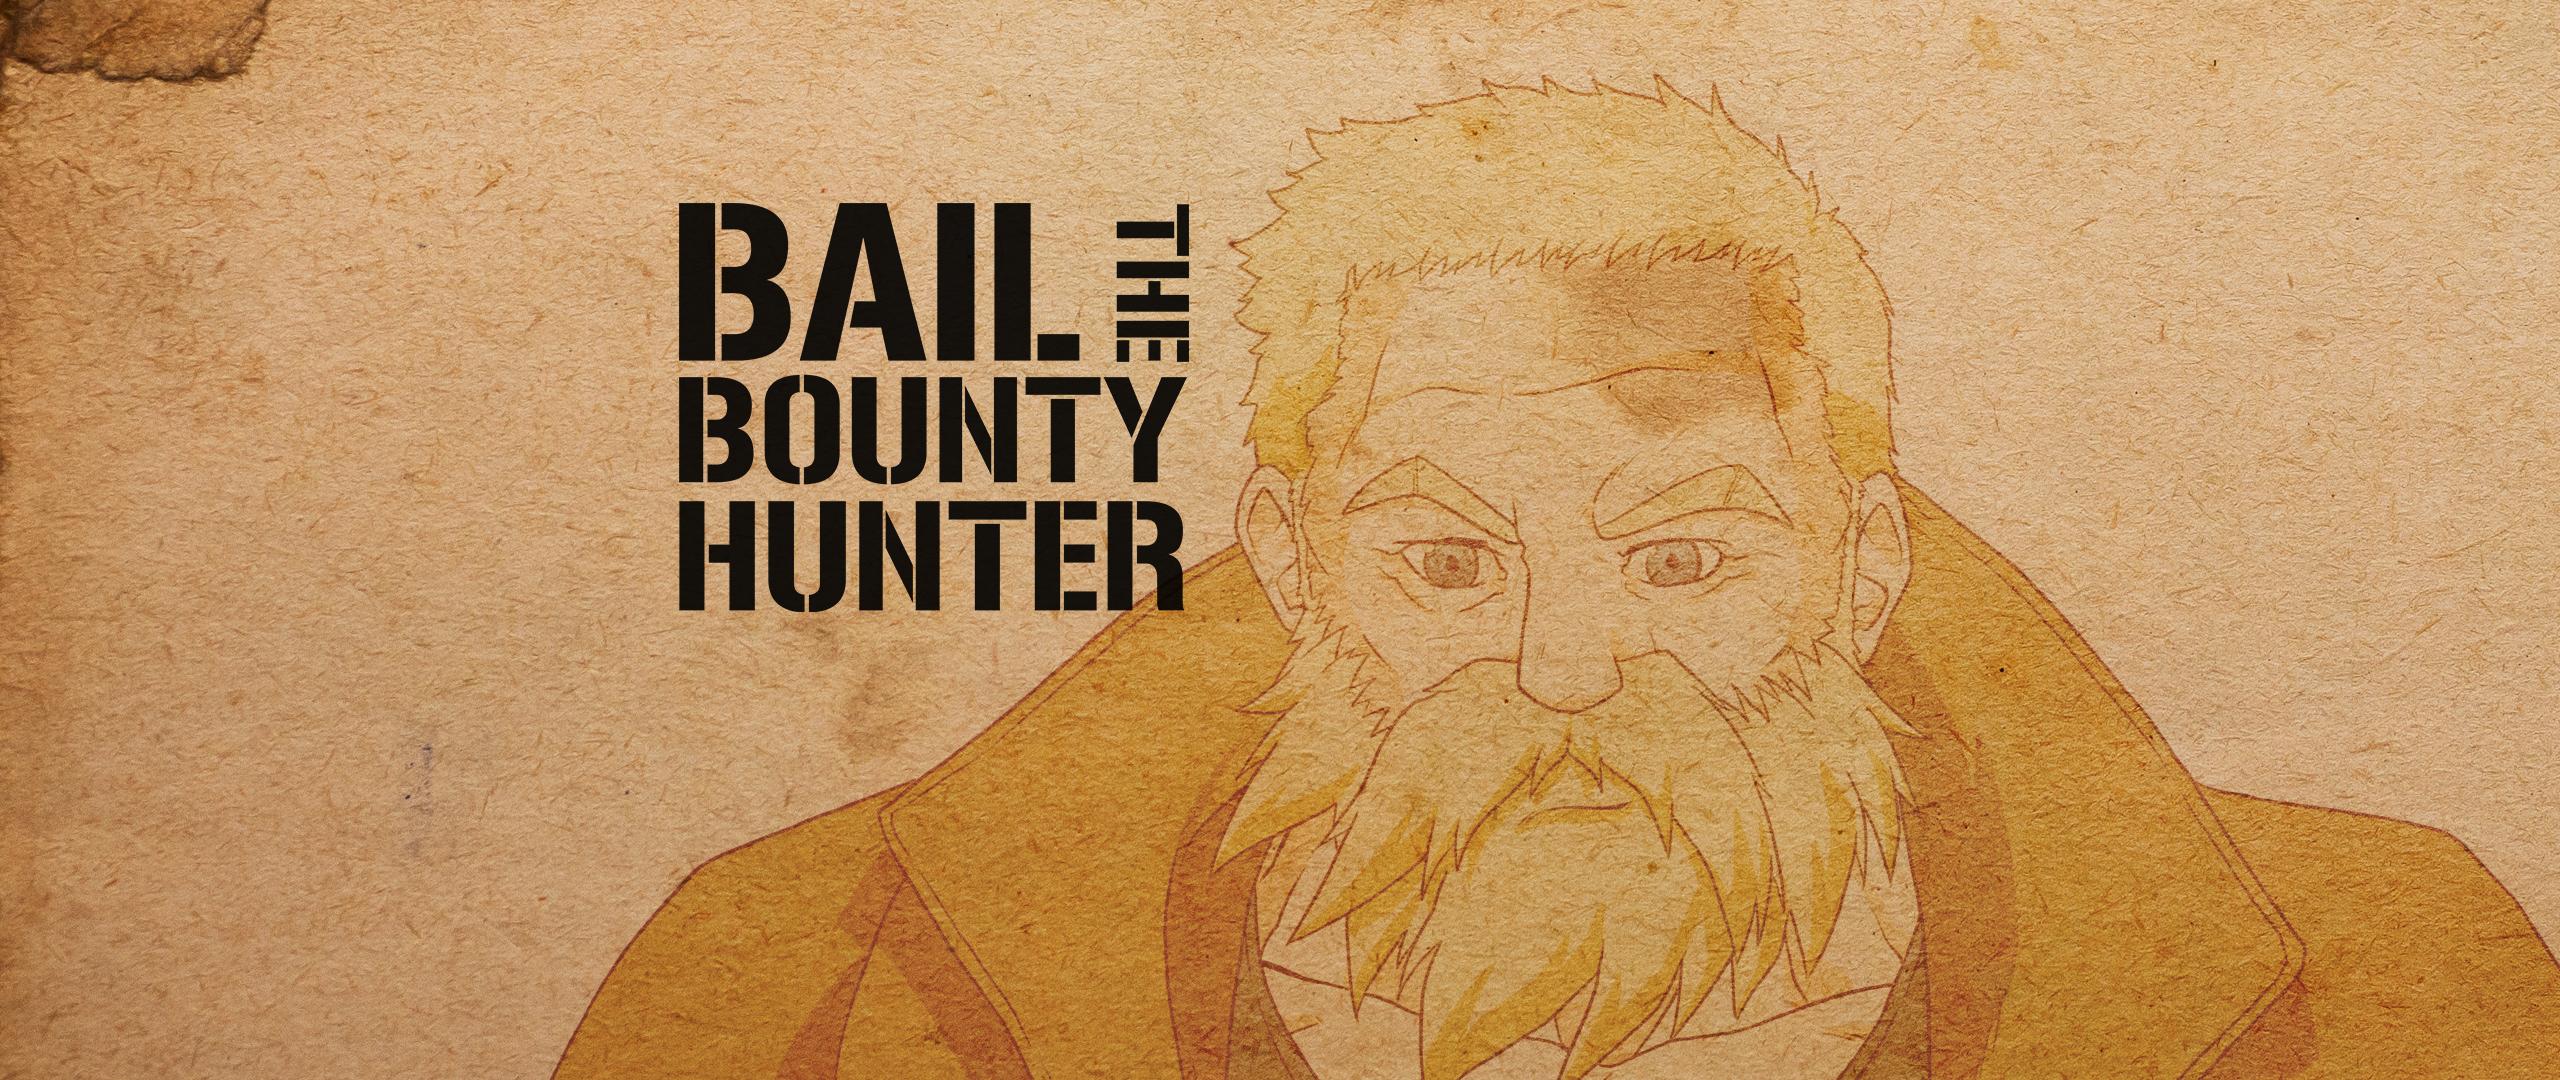 Bail: The Bounty Hunter